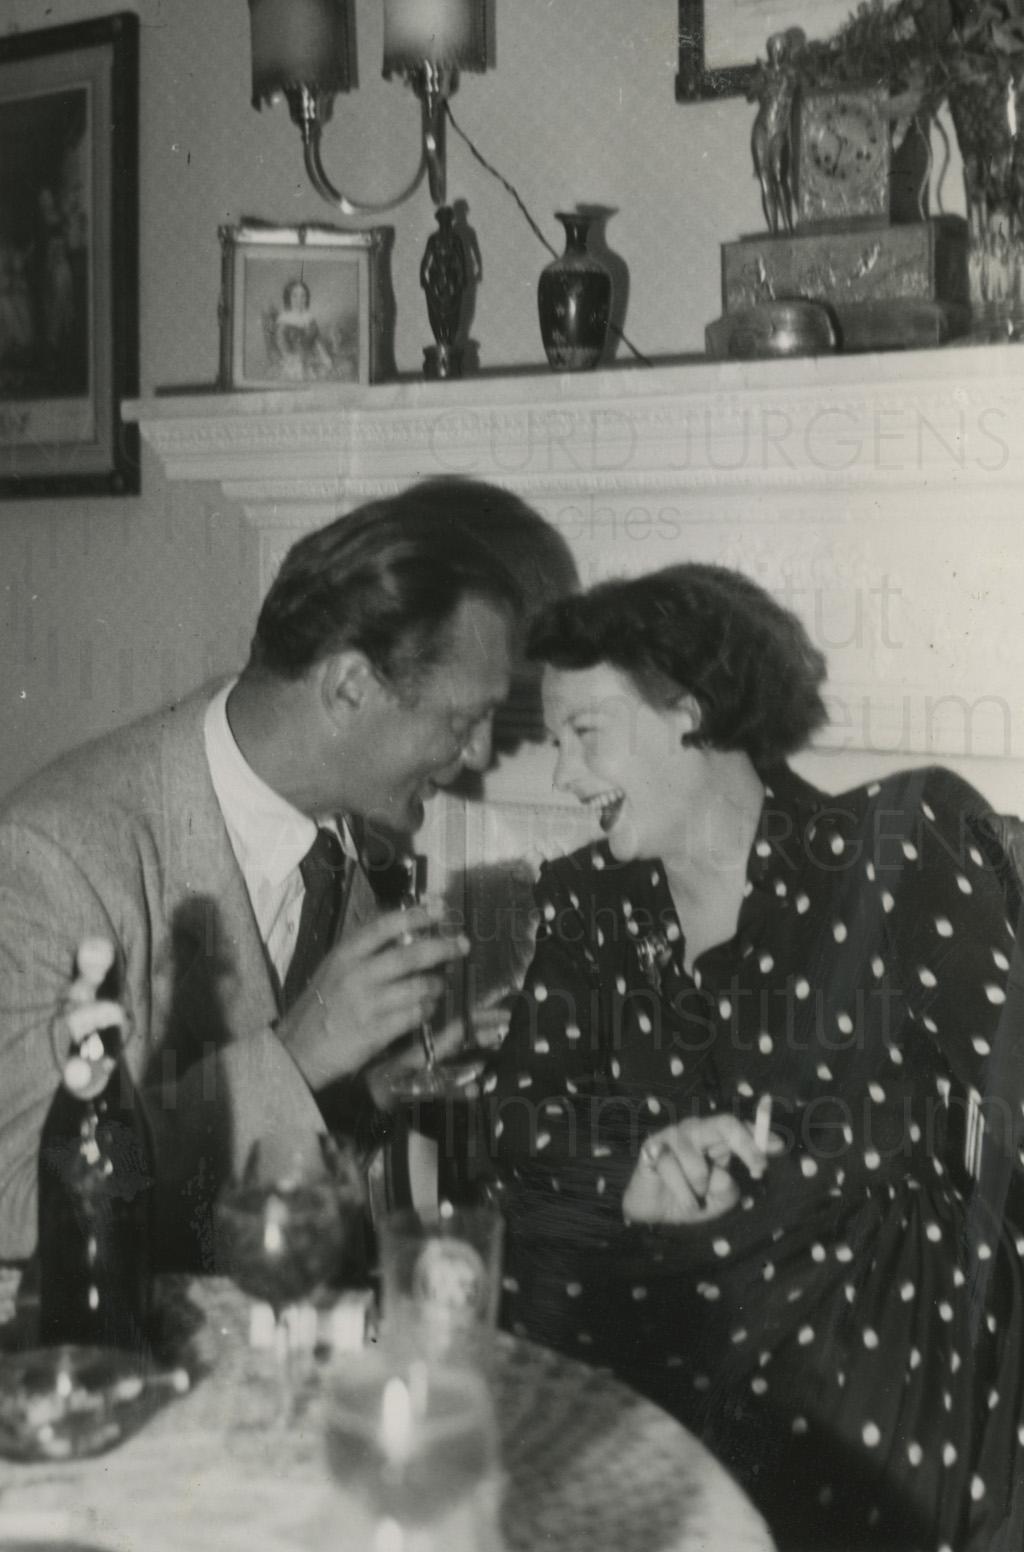 GUTE NACHT, MARY (1950)